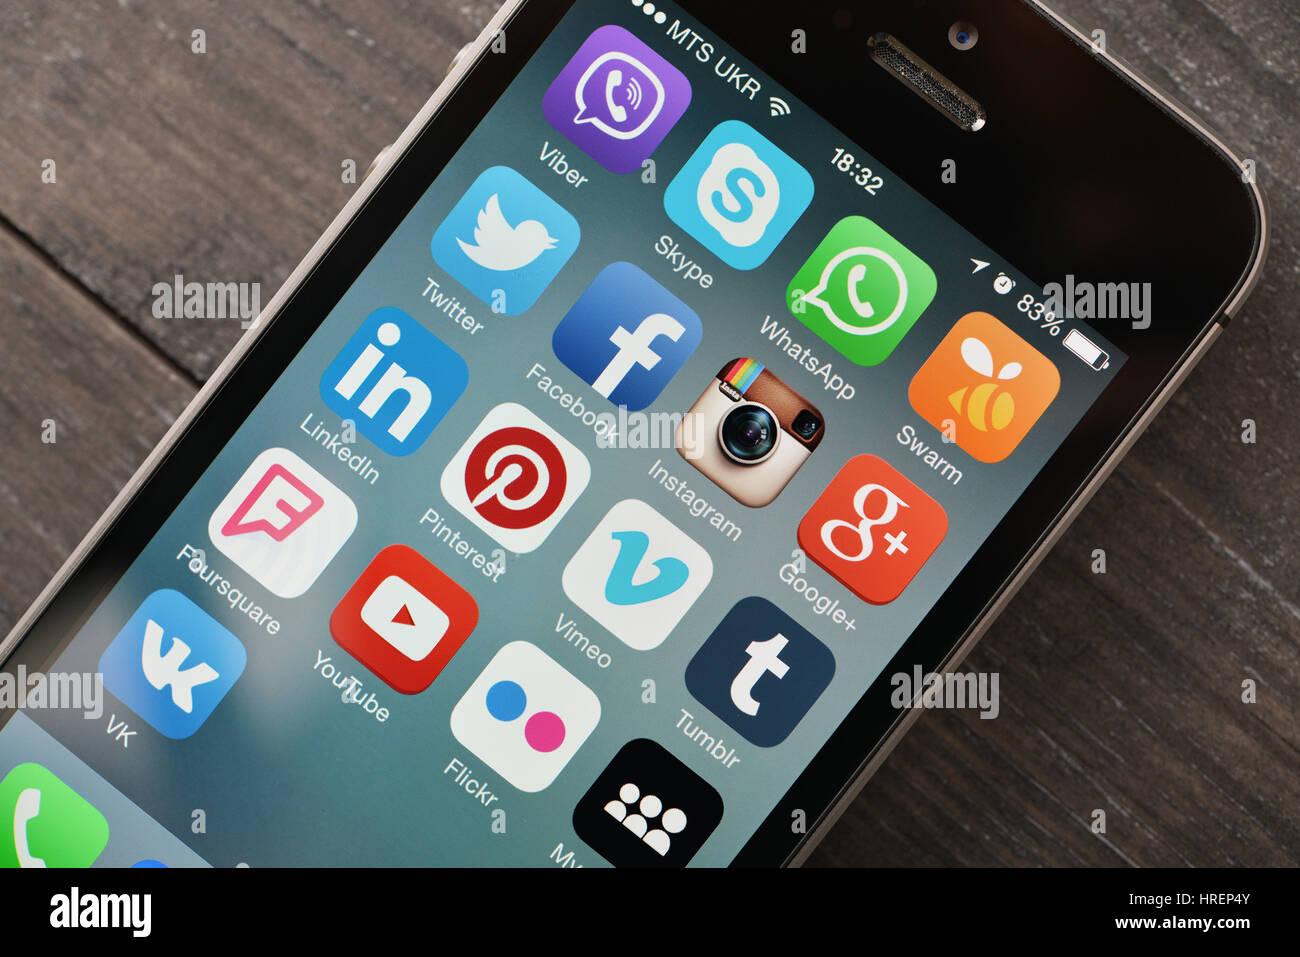 Kiew, UKRAINE - 29. Januar 2015: Social Media-Symbole auf dem Bildschirm des Smartphones. Social Media sind beliebteste Stockbild